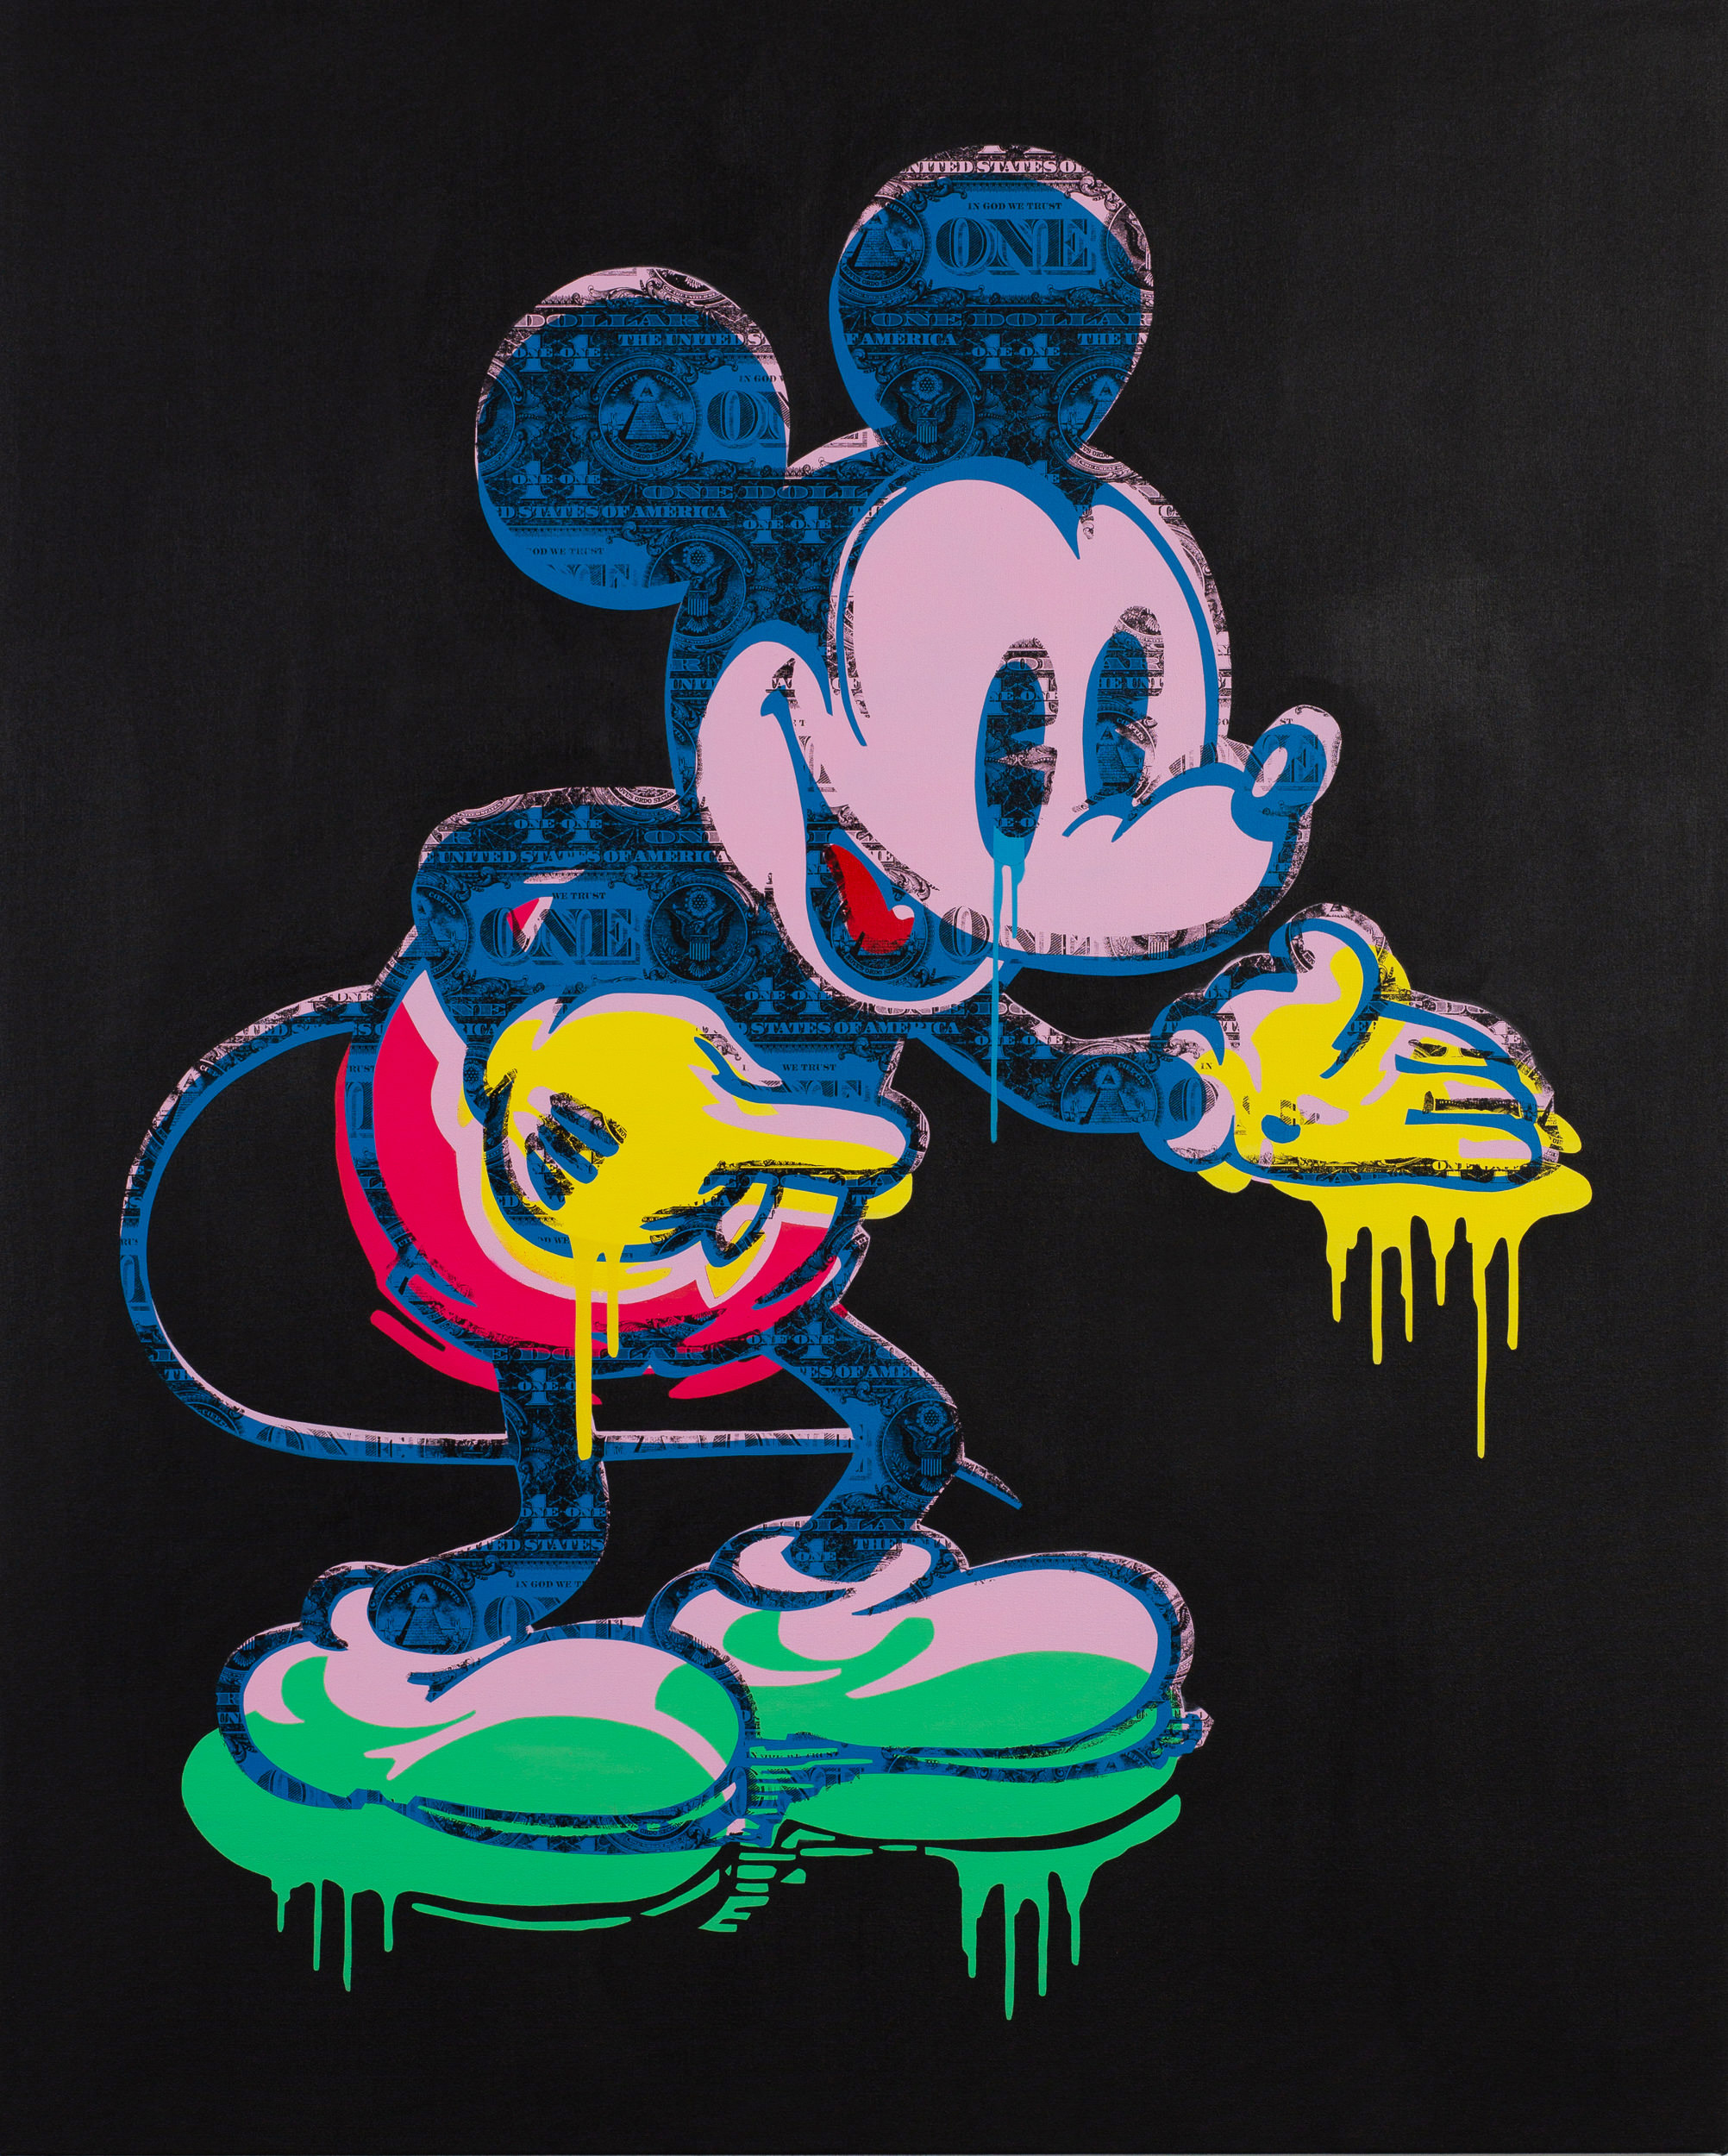 Popaganda-Mouse-Acrylic_Spray_paint_screenprint_emulsion_varnish_on_canvas_150cm-x-120cm-x4.5cm-£3750.jpg